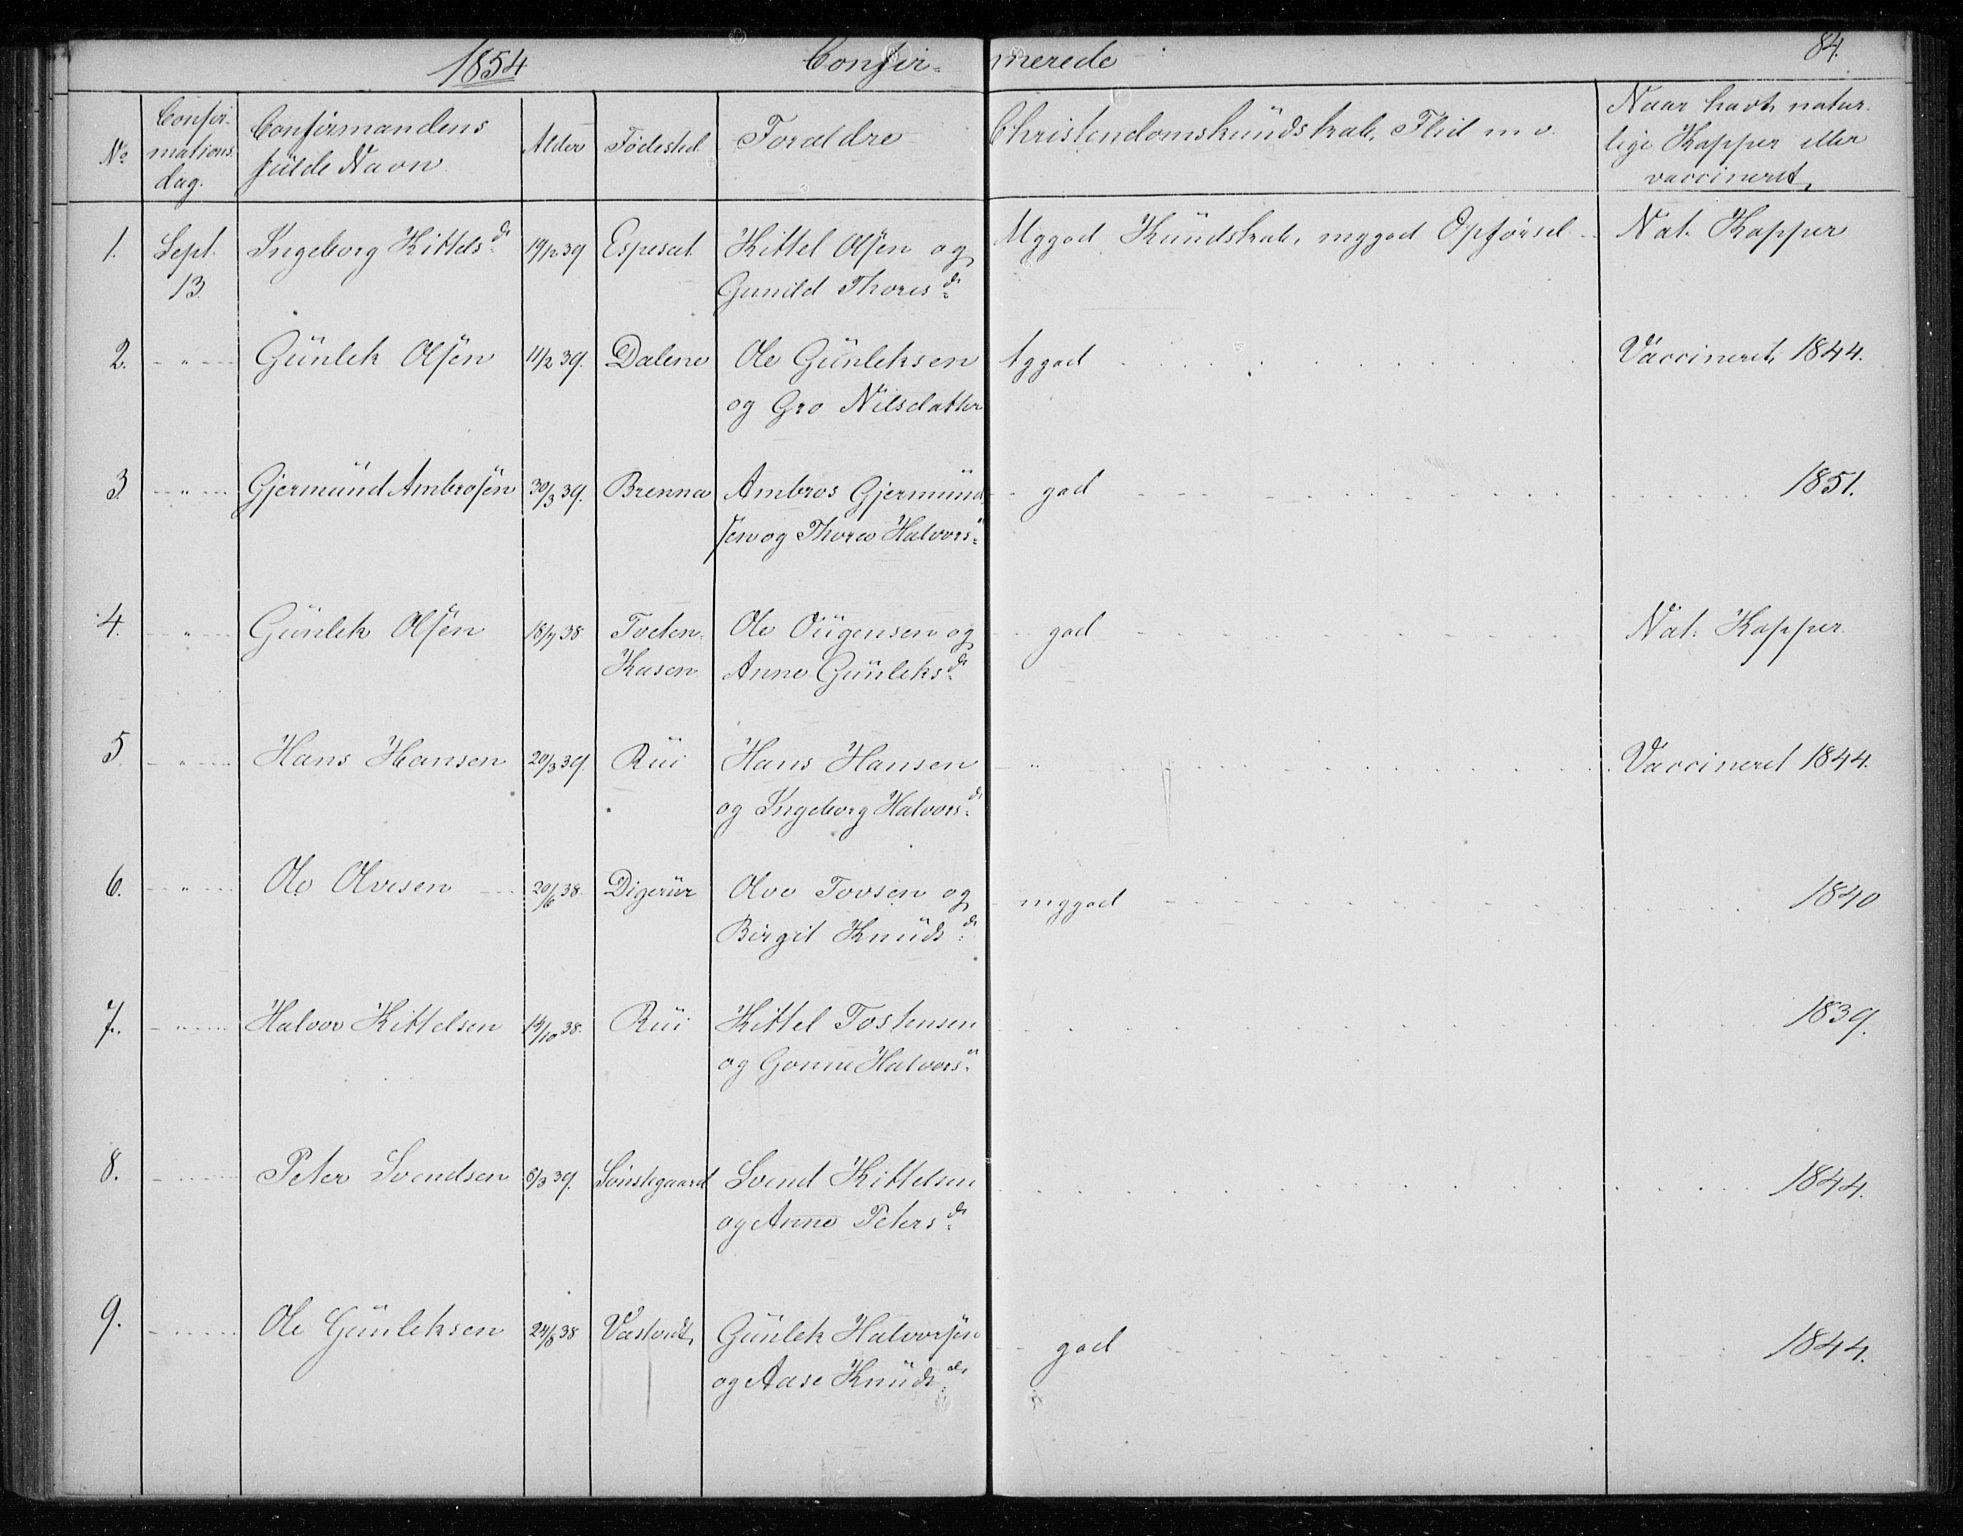 SAKO, Gransherad kirkebøker, F/Fb/L0003: Ministerialbok nr. II 3, 1844-1859, s. 84